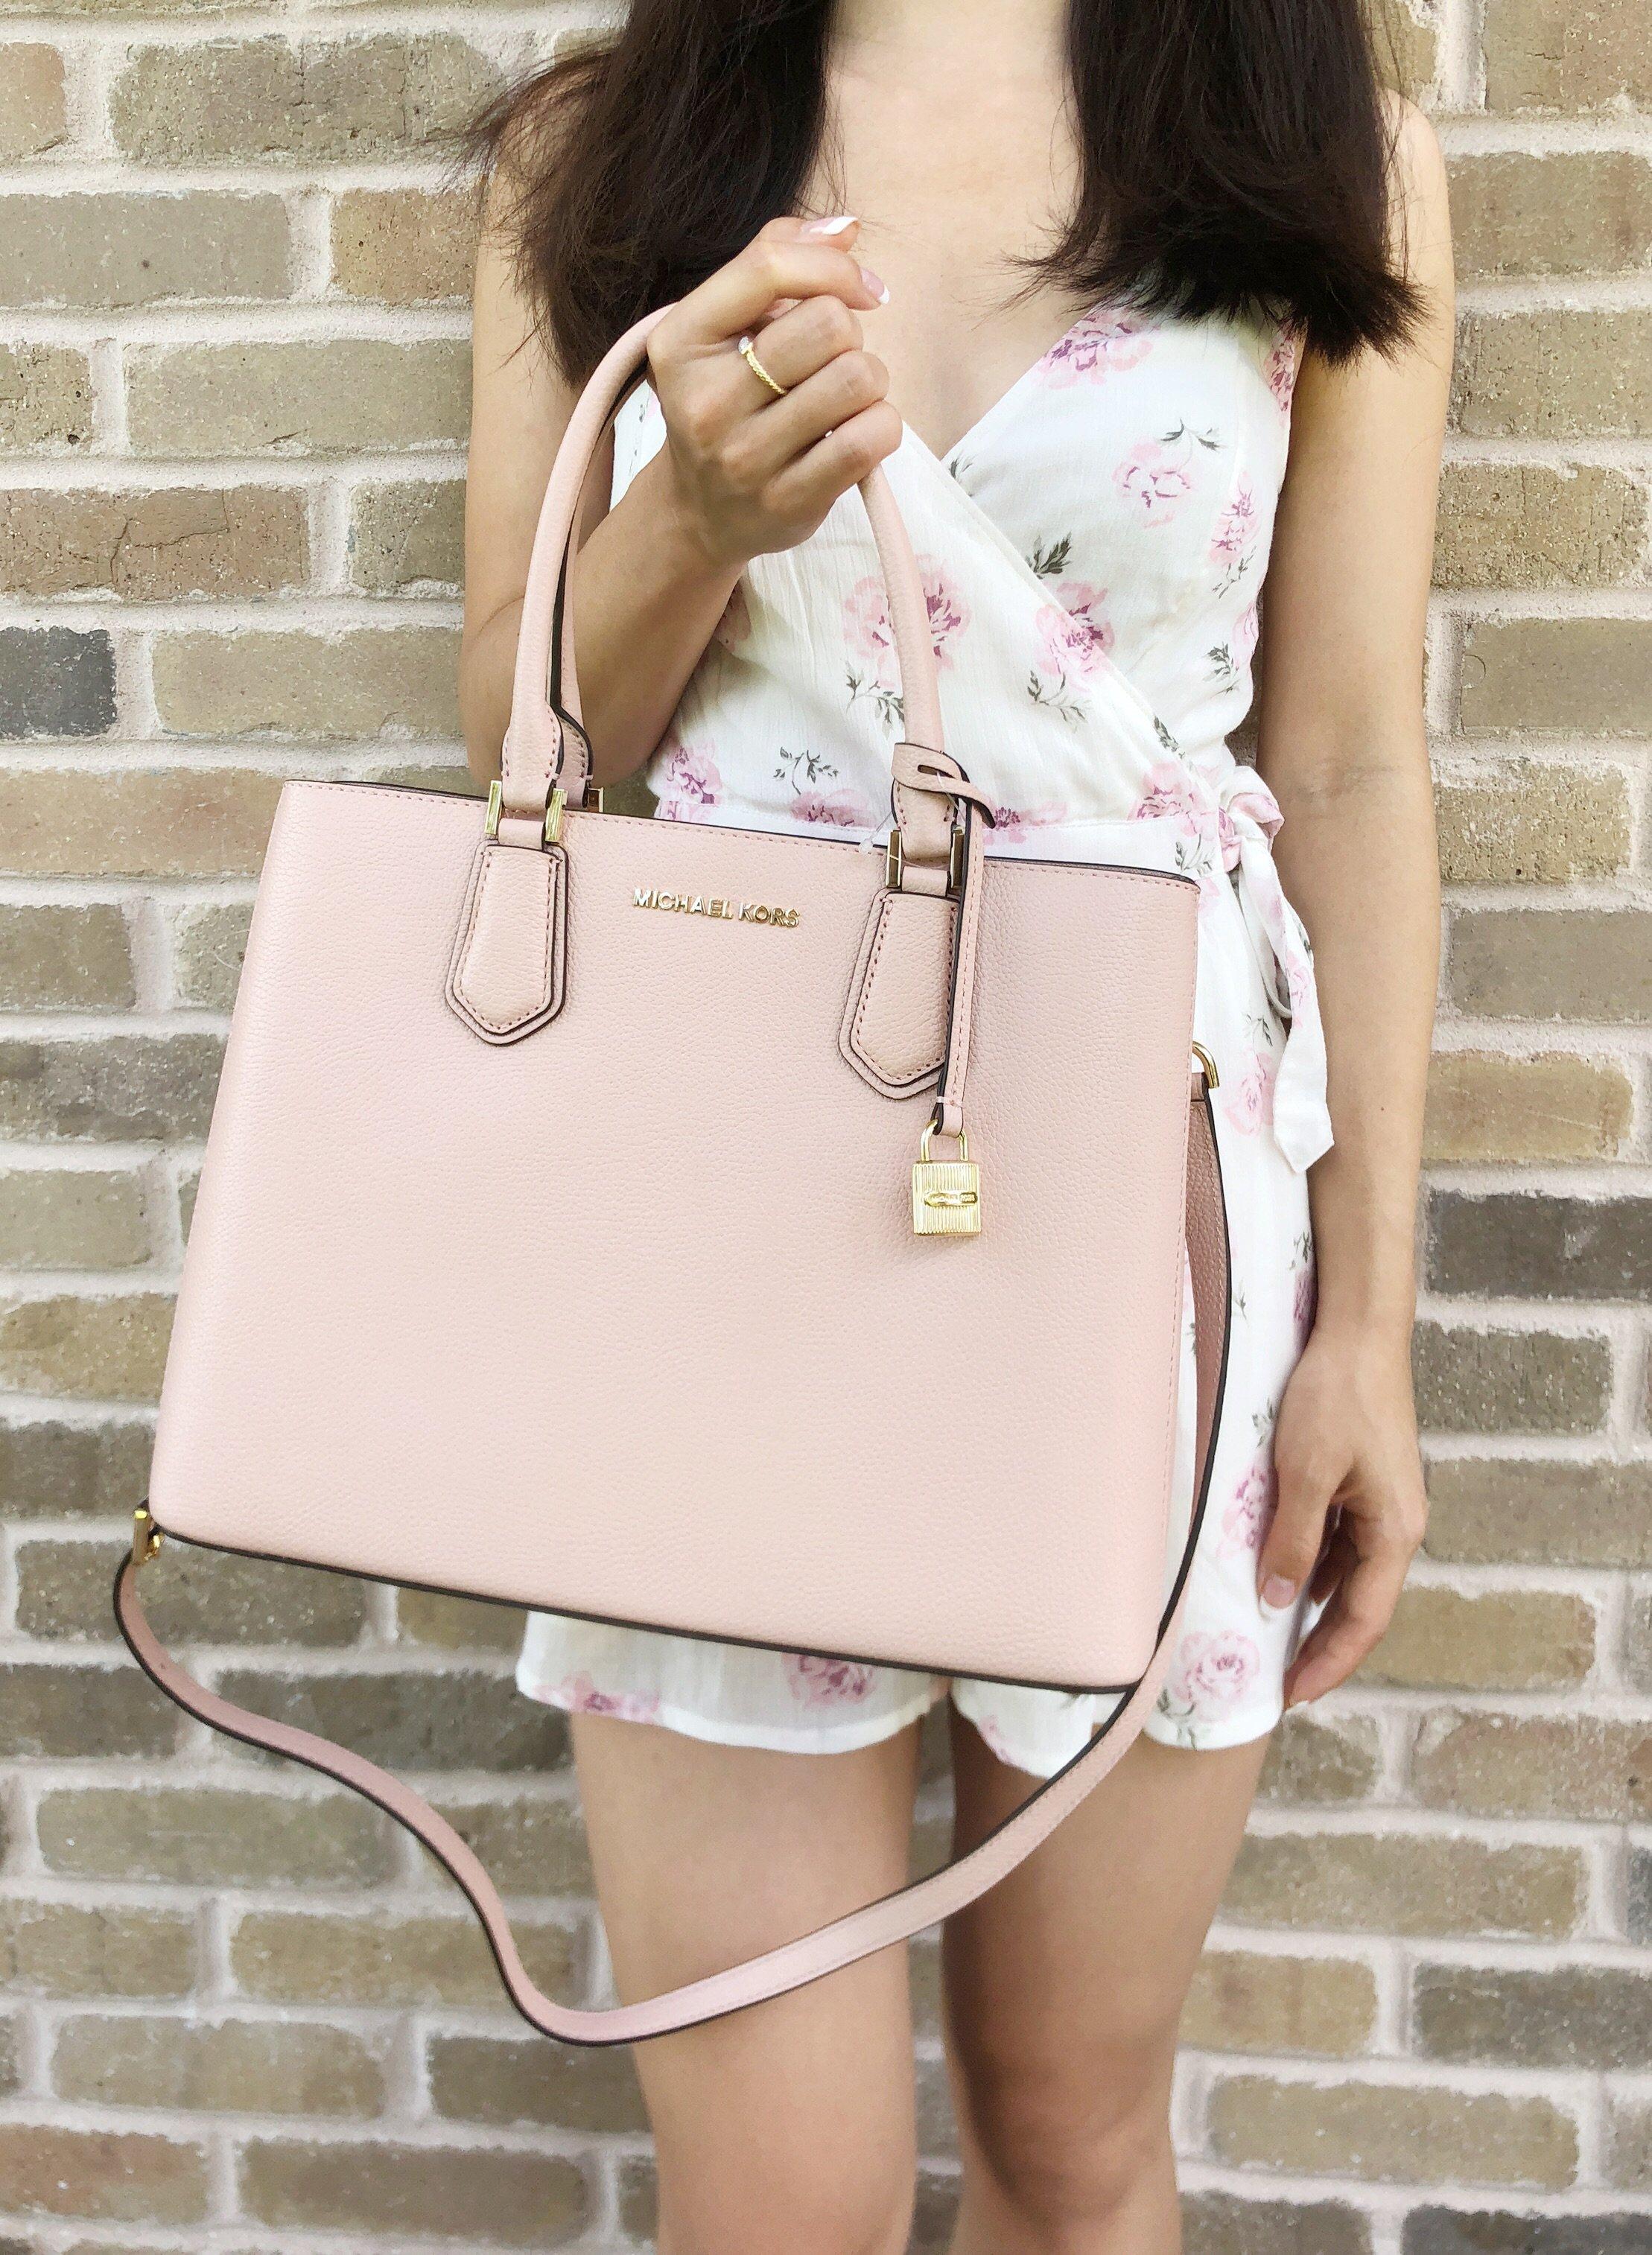 a0c9c9ae2433 Michael Kors Adele Mercer Large Satchel Pastel Pink Ballet Leather ...